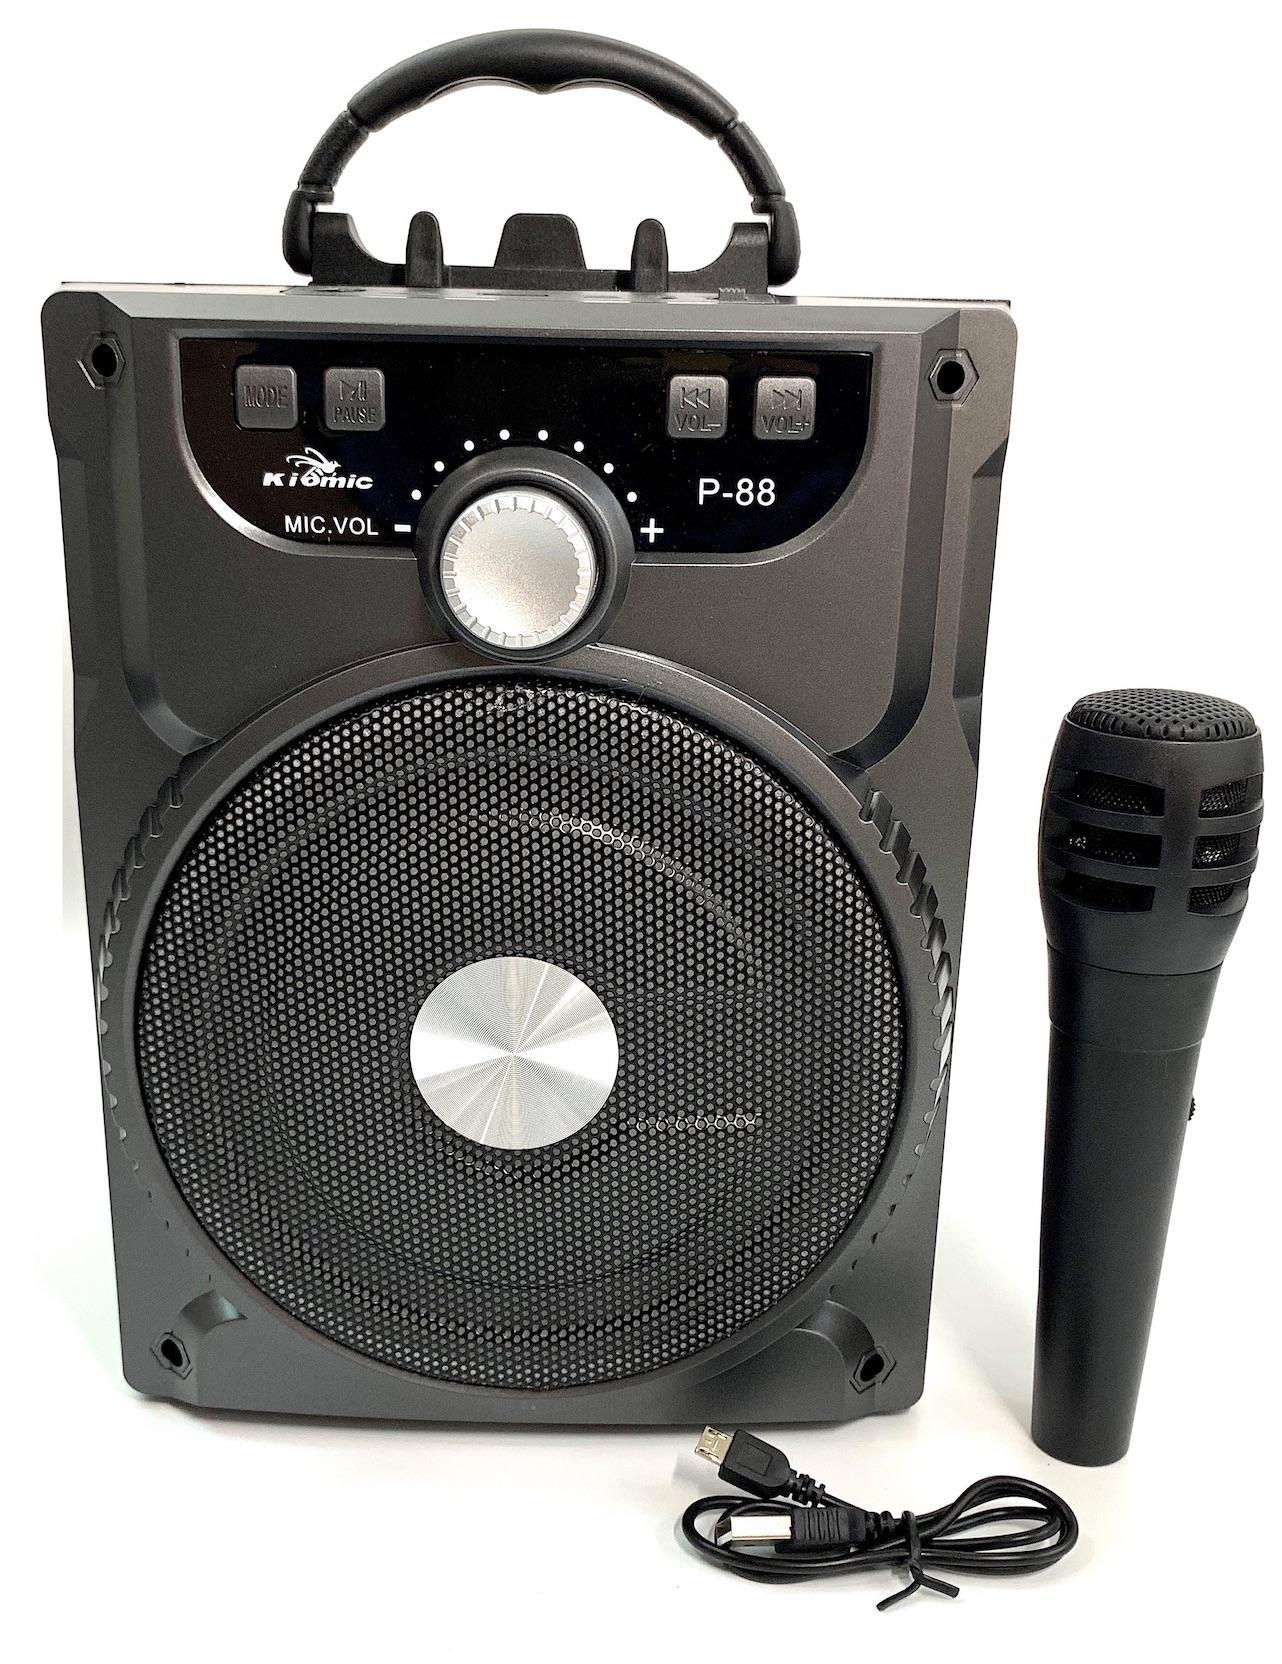 (Tặng Micro Hát Karaoke) Loa Bluetooth di động 20W Minchan - Loa kéo P87 NT8 NT9 Âm Thanh Cực Hay - Loa Mini - Loa Vi Tinh - Loa May Tinh KIOMIC